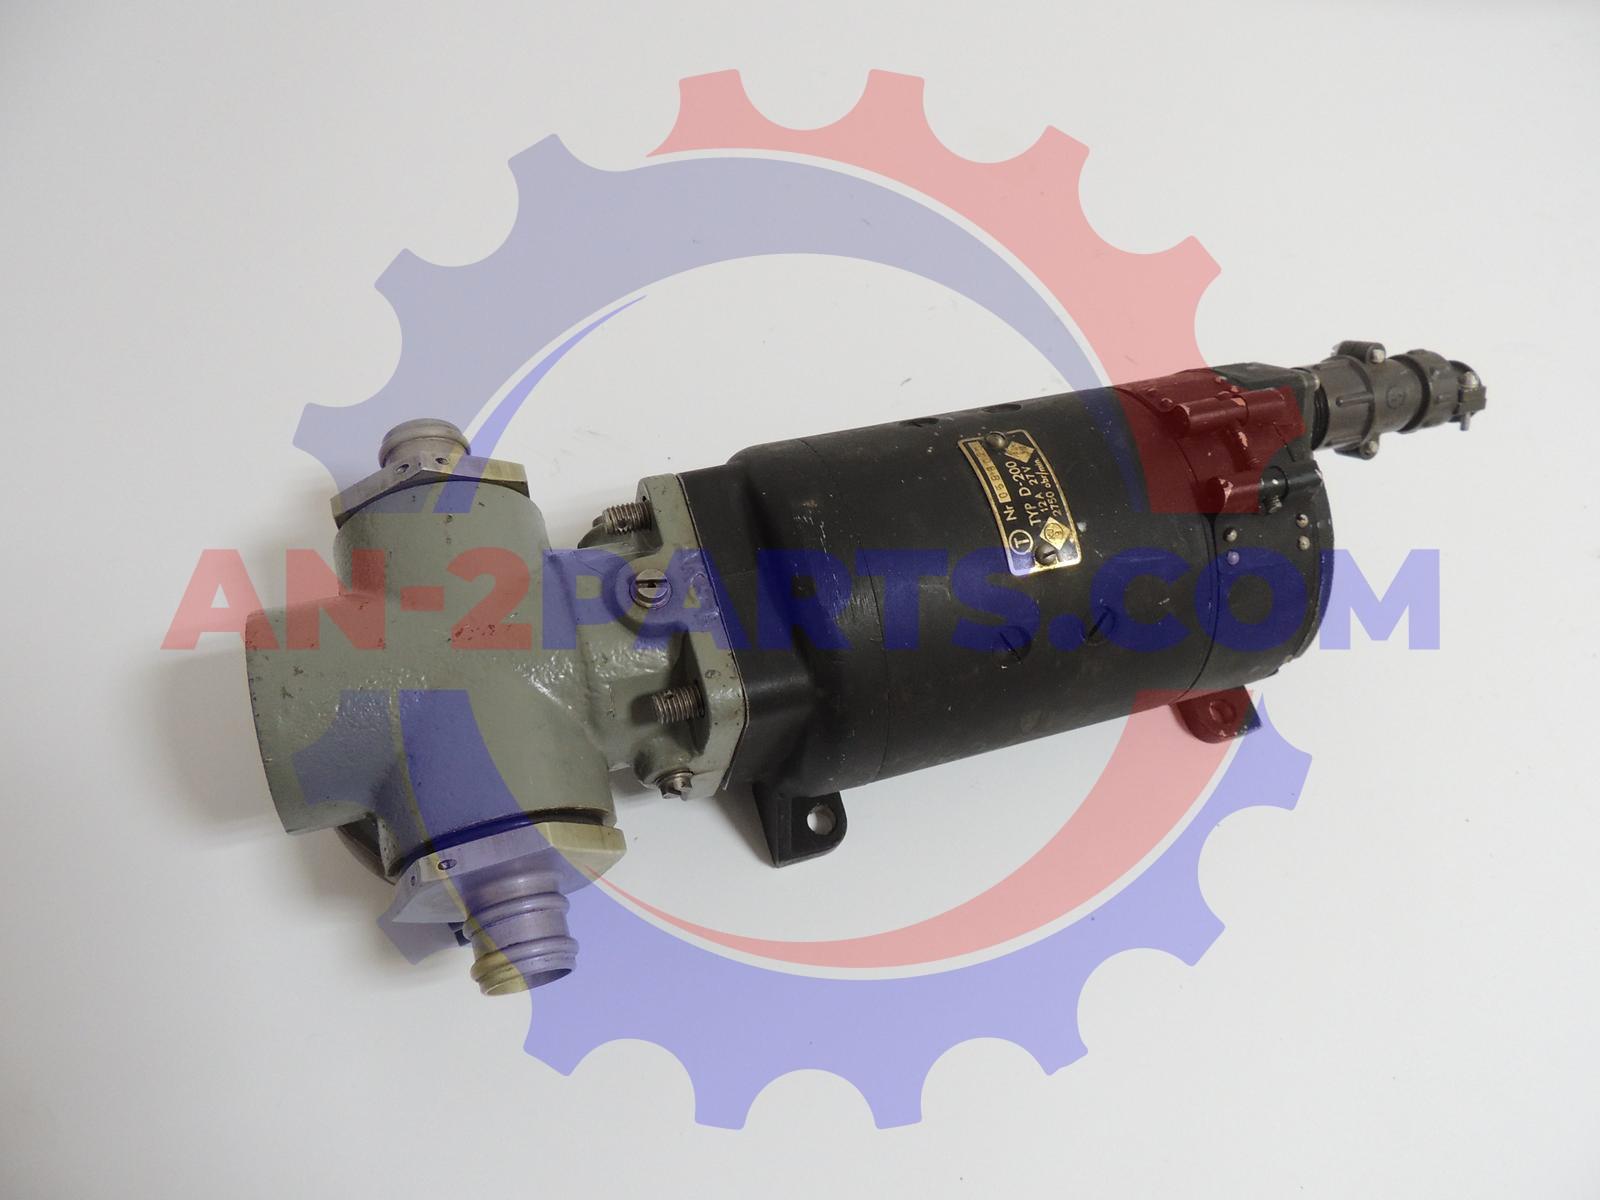 Pompa paliwowa, BPK-4, Fuel pump